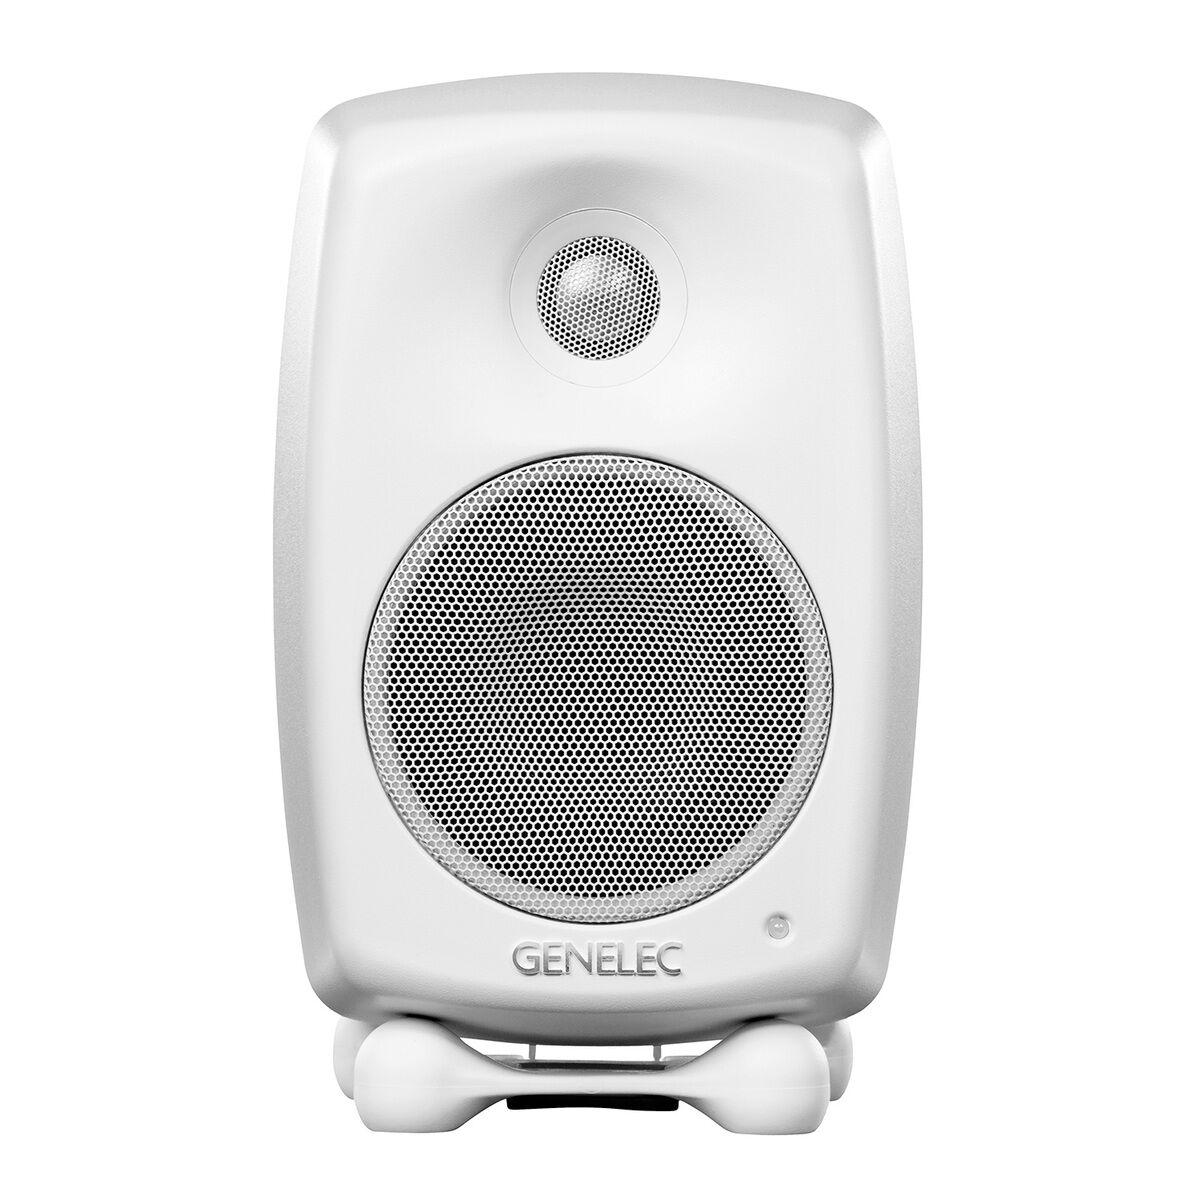 Genelec G Two (B) active speaker, white